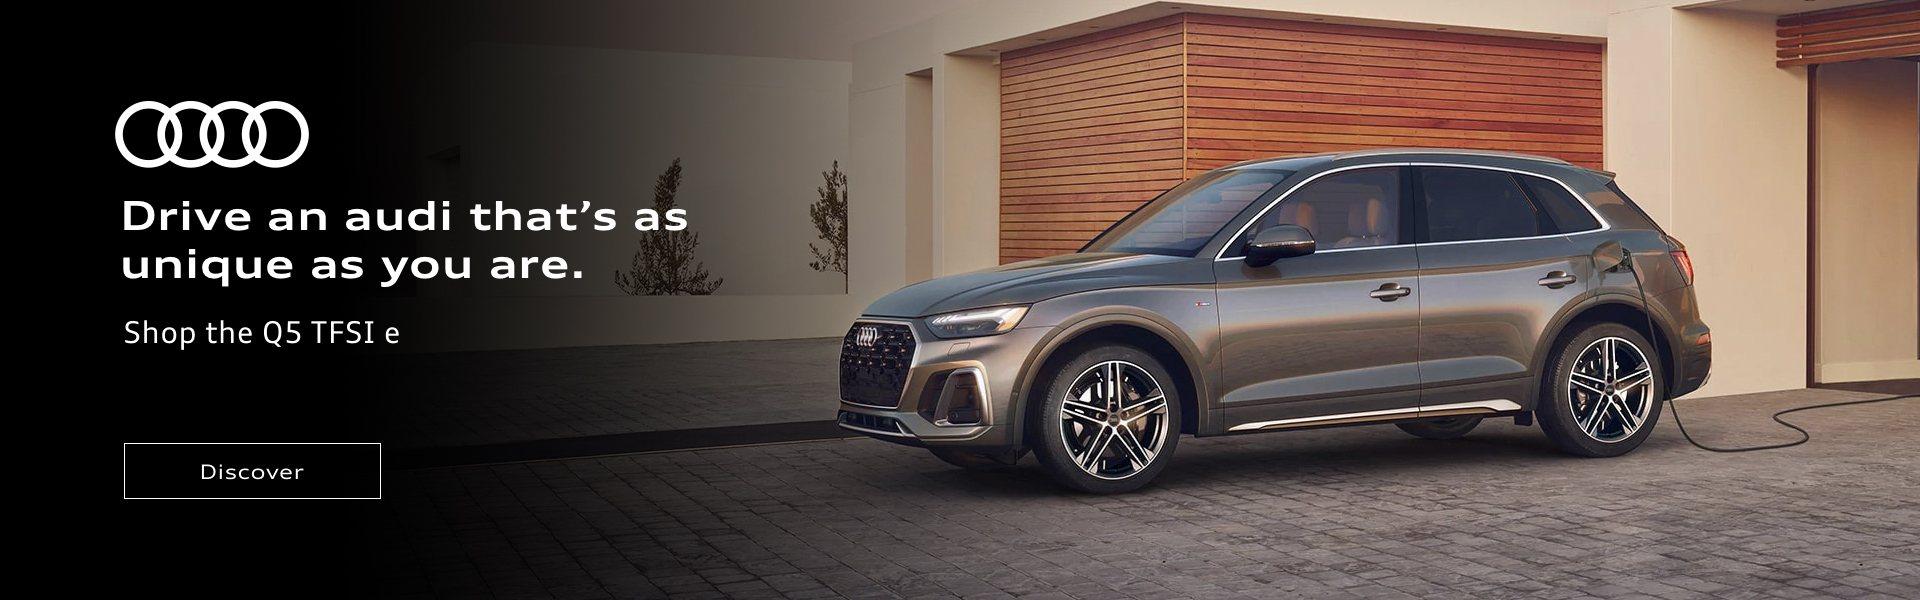 Audi q5e promo banner